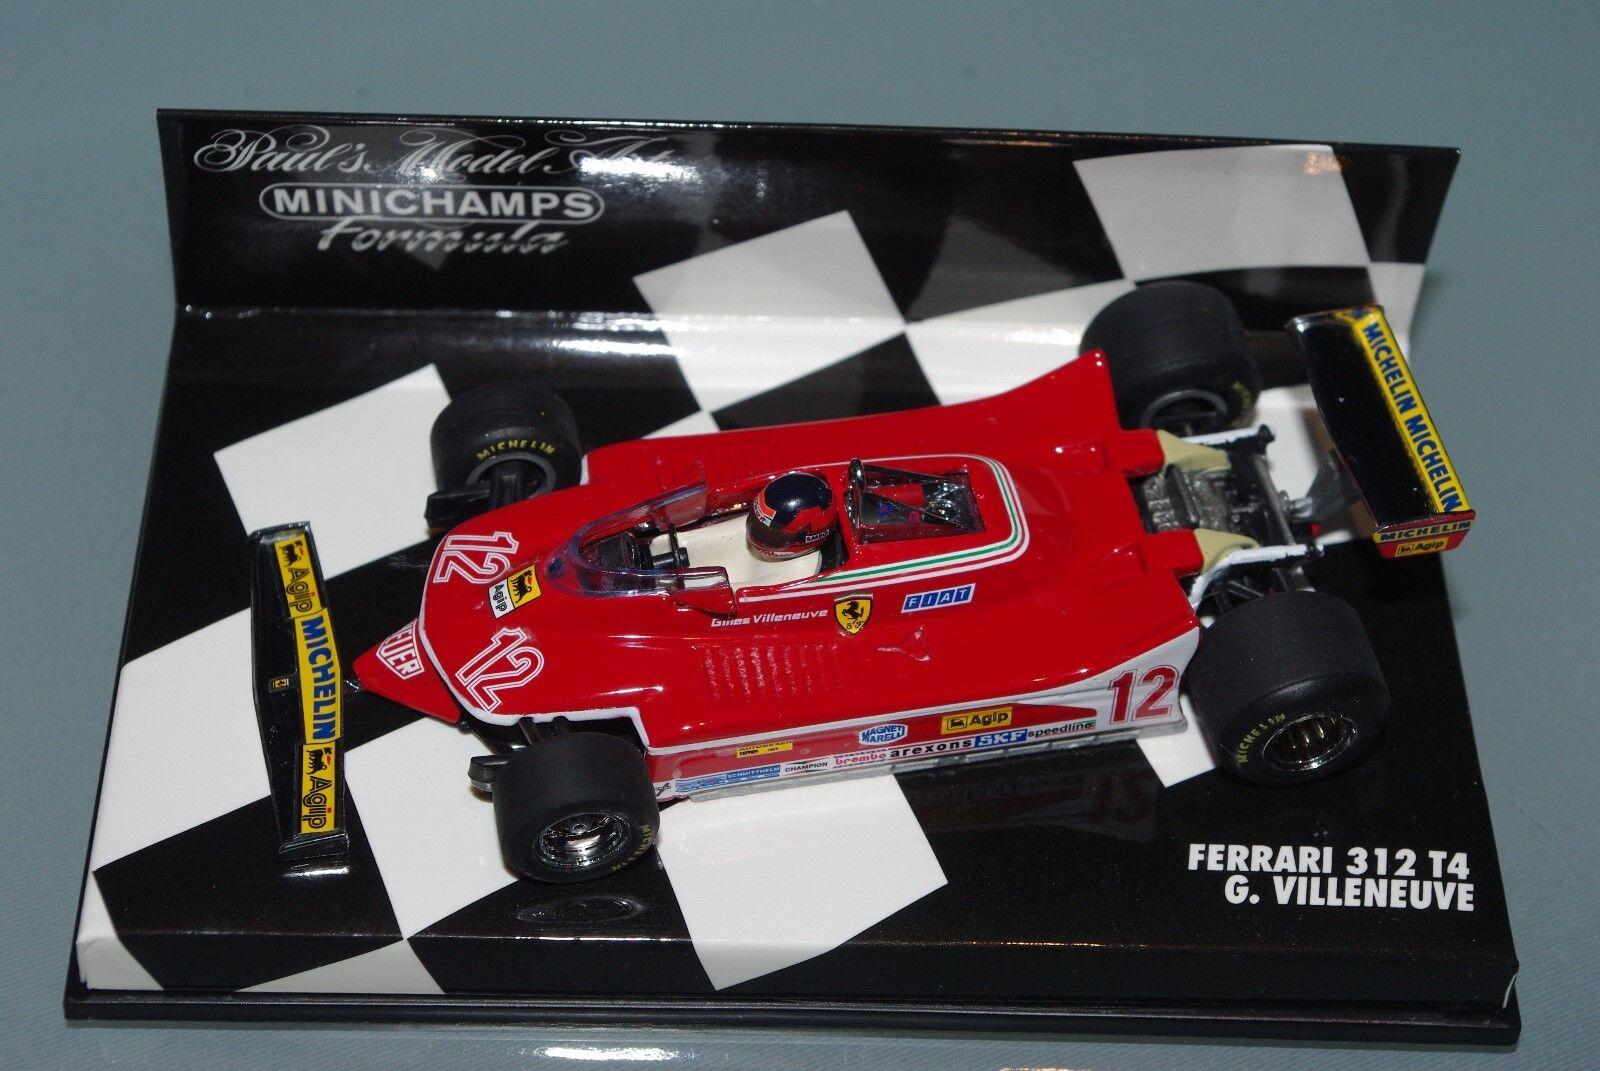 Minichamps F1 1 43 FERRARI 312 T4-Gilles Villeneuve 1979